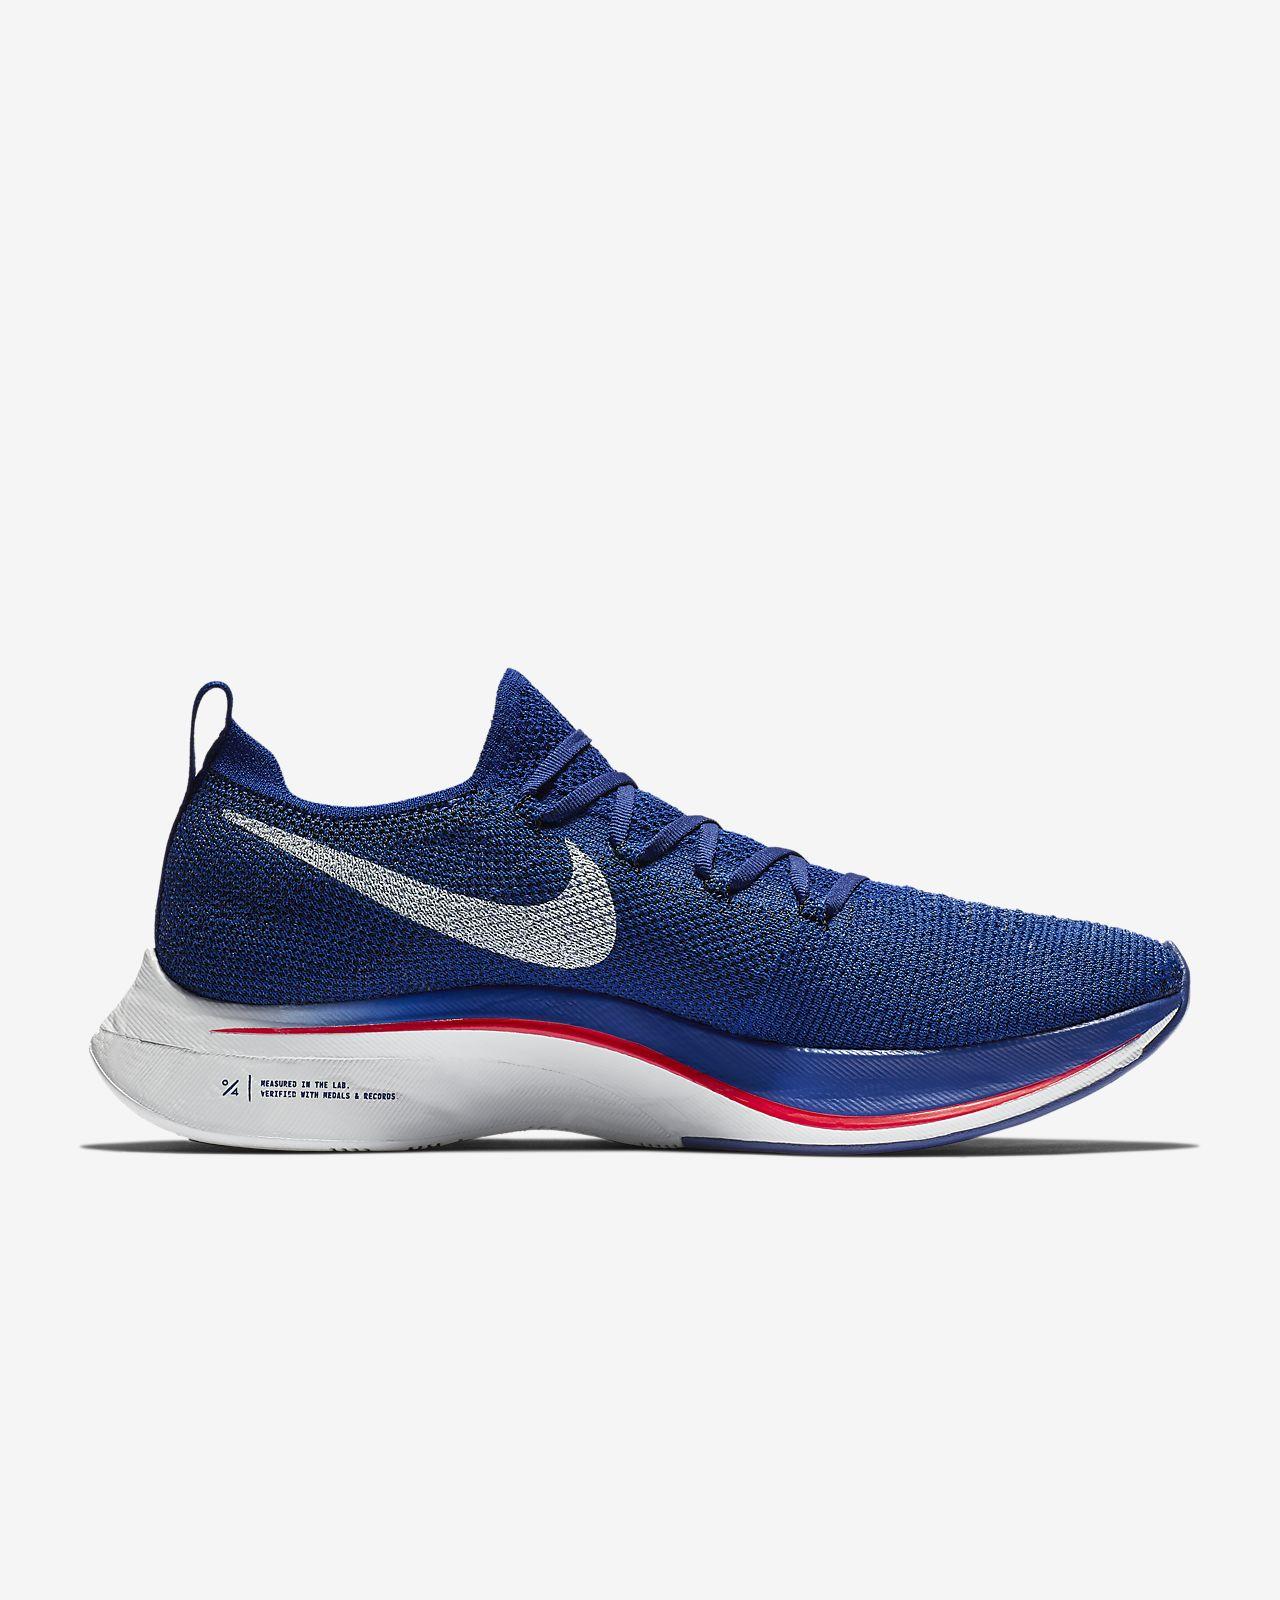 online store 2bcd2 88120 ... Nike Vaporfly 4% Flyknit Laufschuh